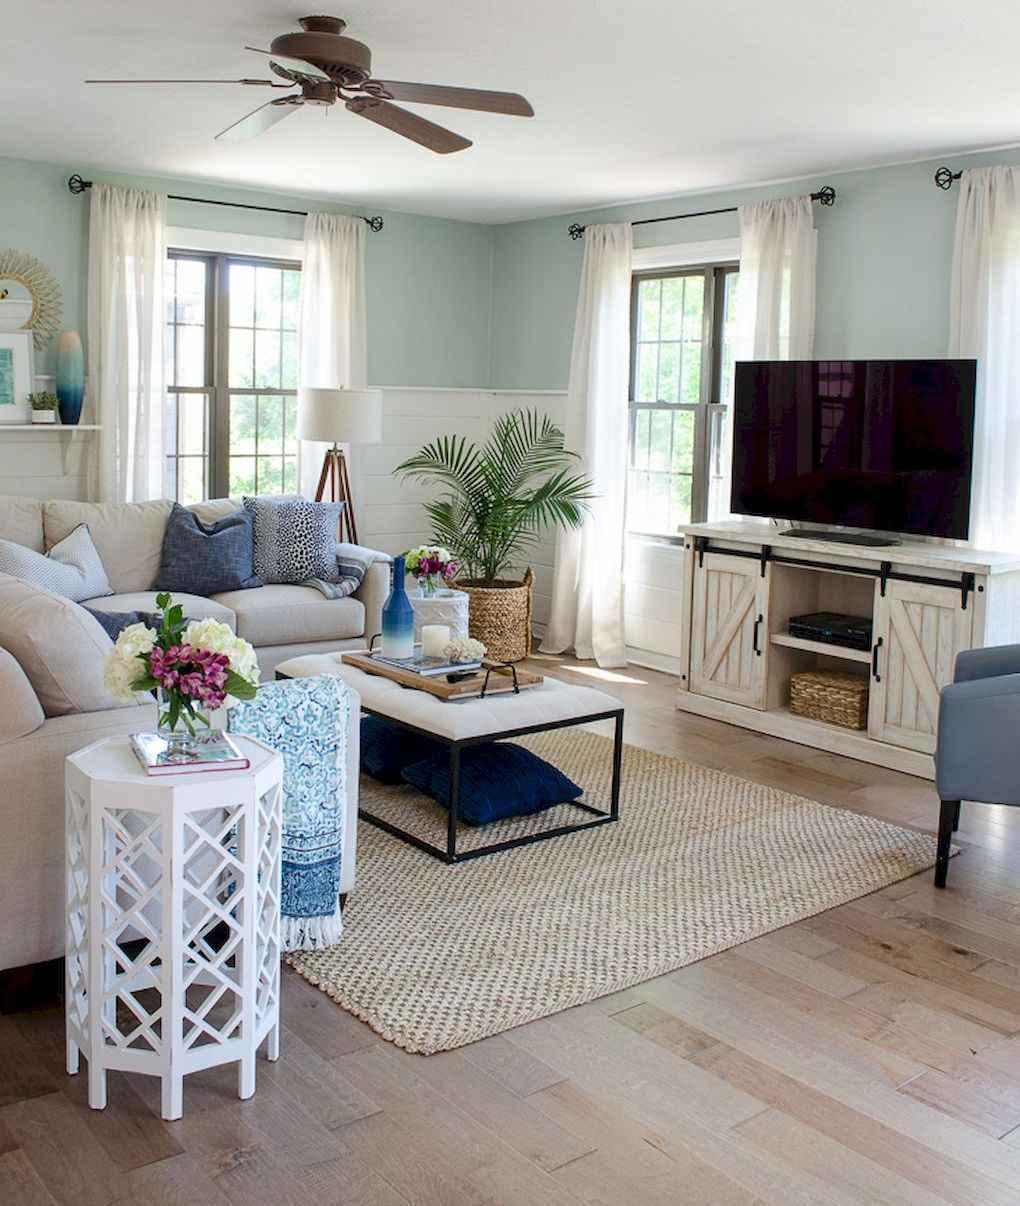 Cool Living Room Decor: 60 Cool Modern Farmhouse Living Room Decor Ideas (51